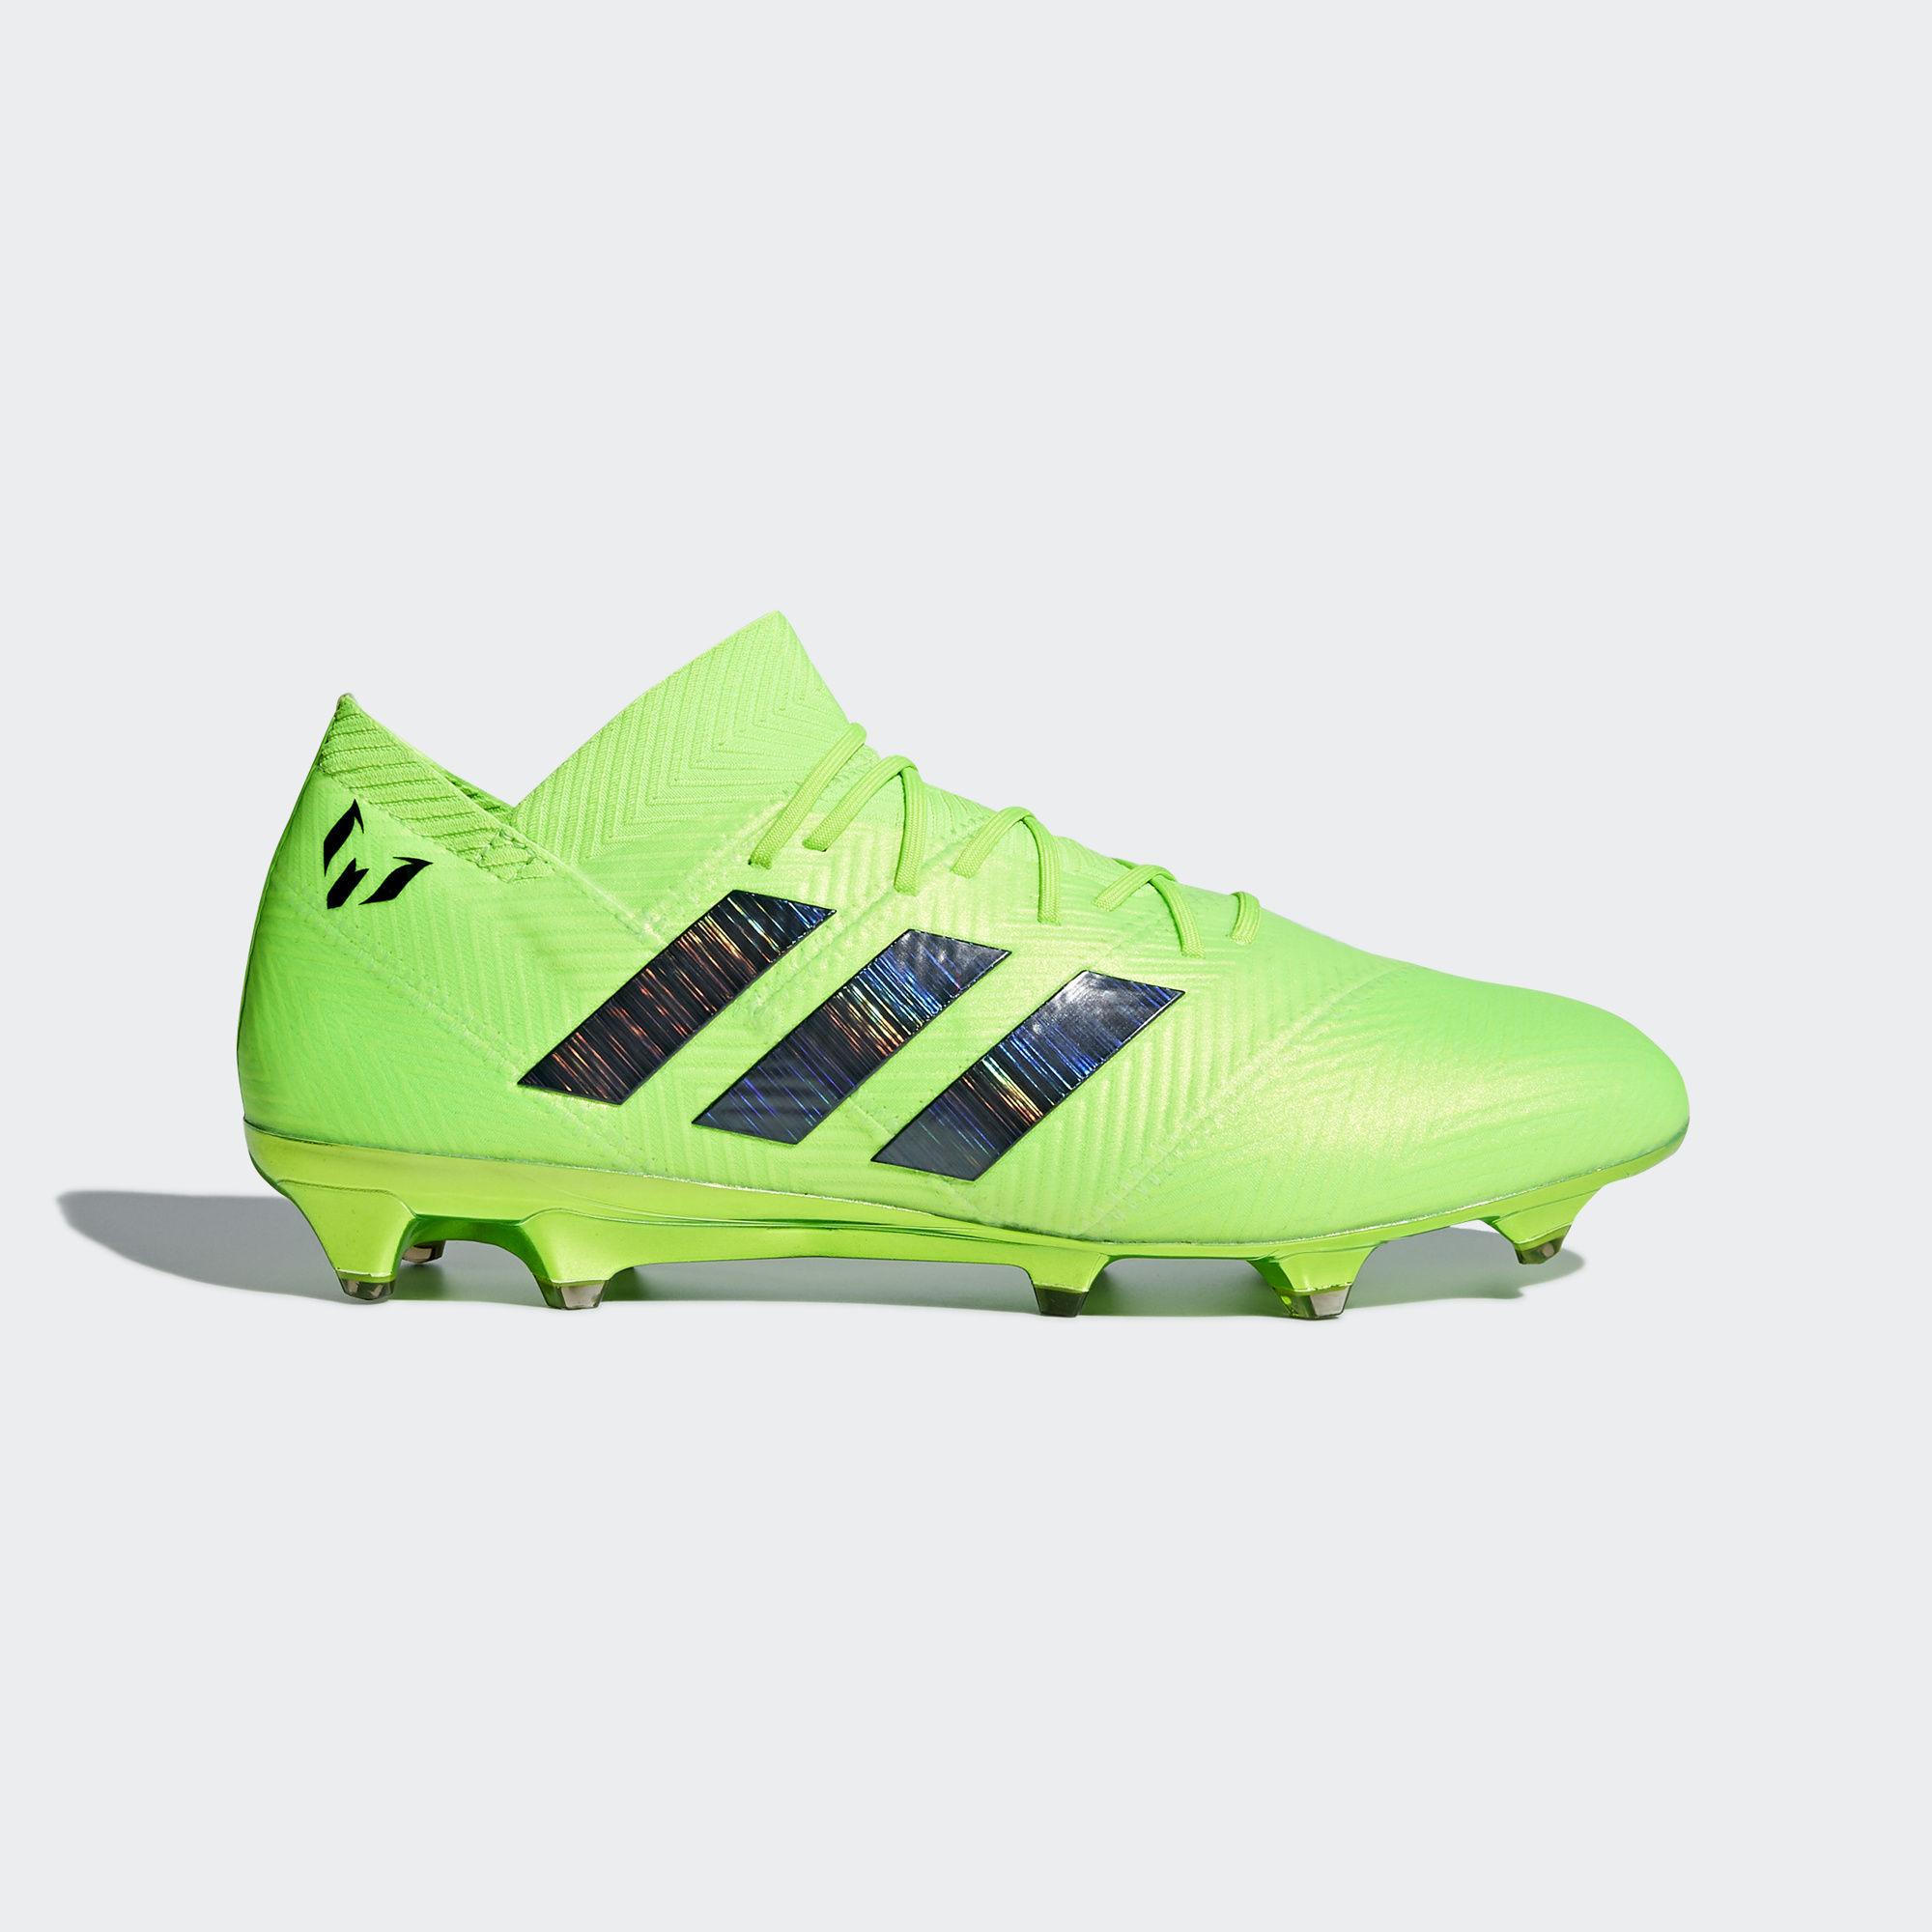 5e99b3578cd8 adidas Nemeziz Messi 18.1 FG - Green/Black - Energy Mode